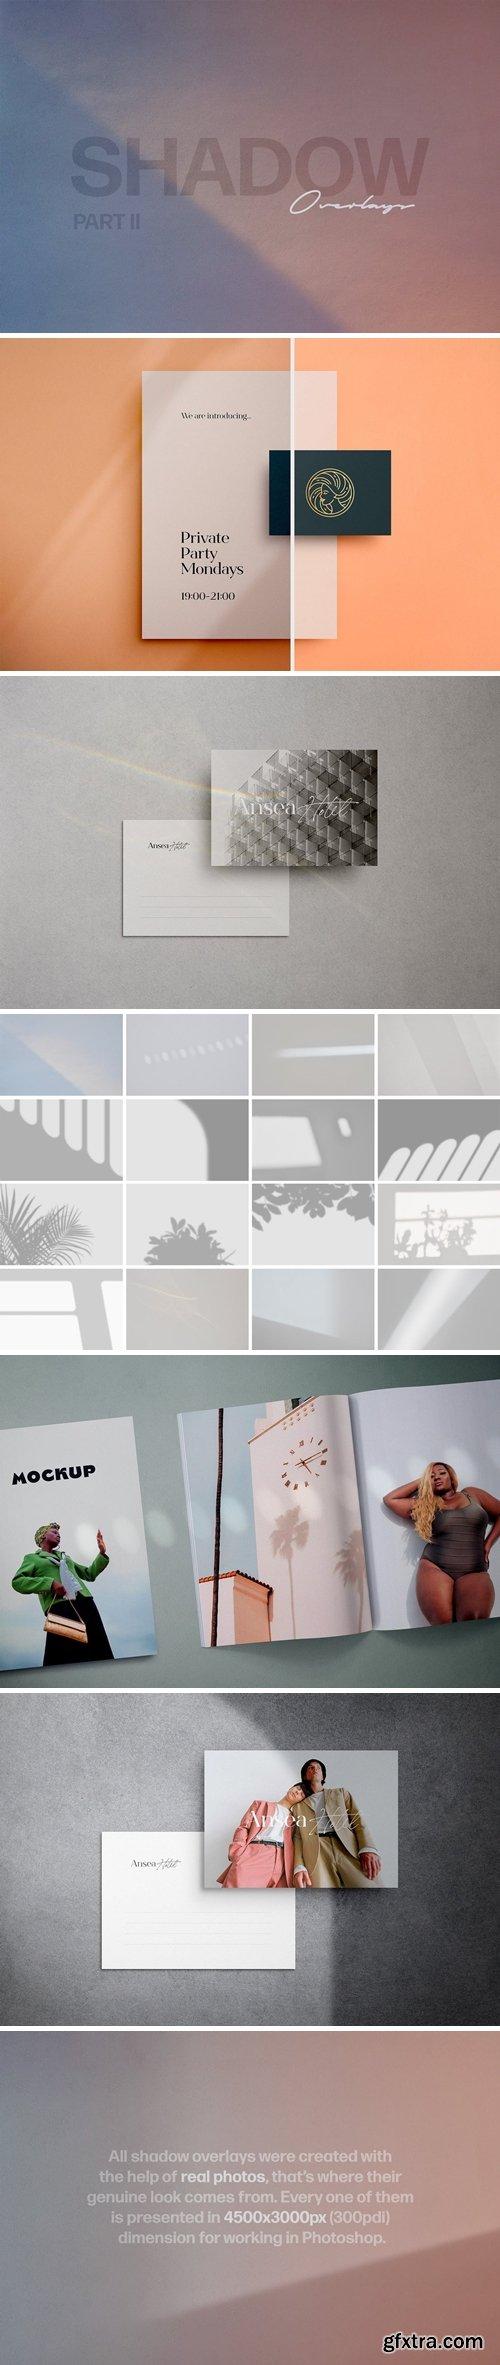 Shadow Play Photo Overlays Vol.2